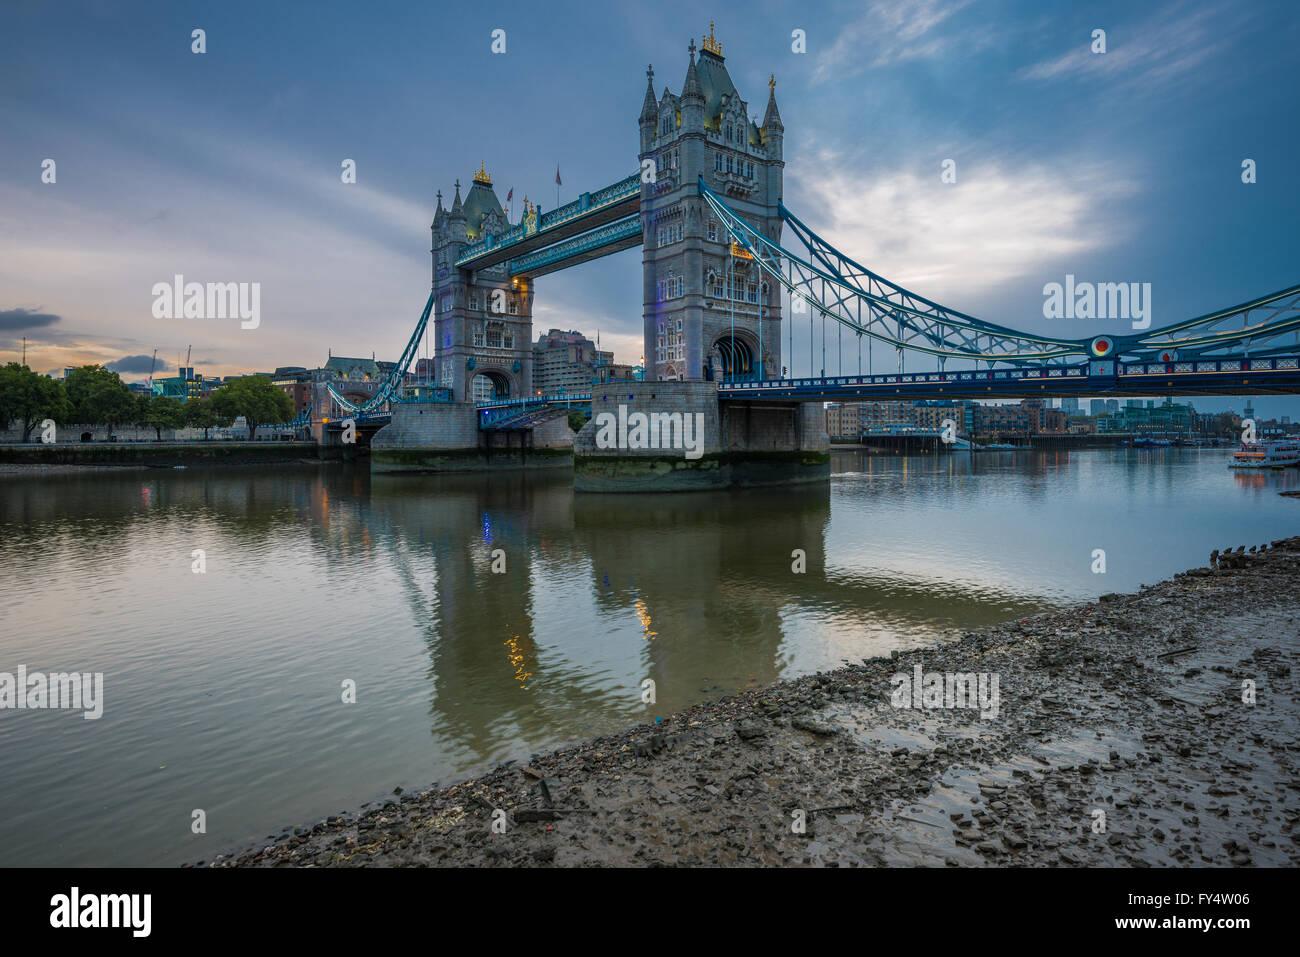 Tower Bridge, Londres, Reino Unido. Imagen De Stock